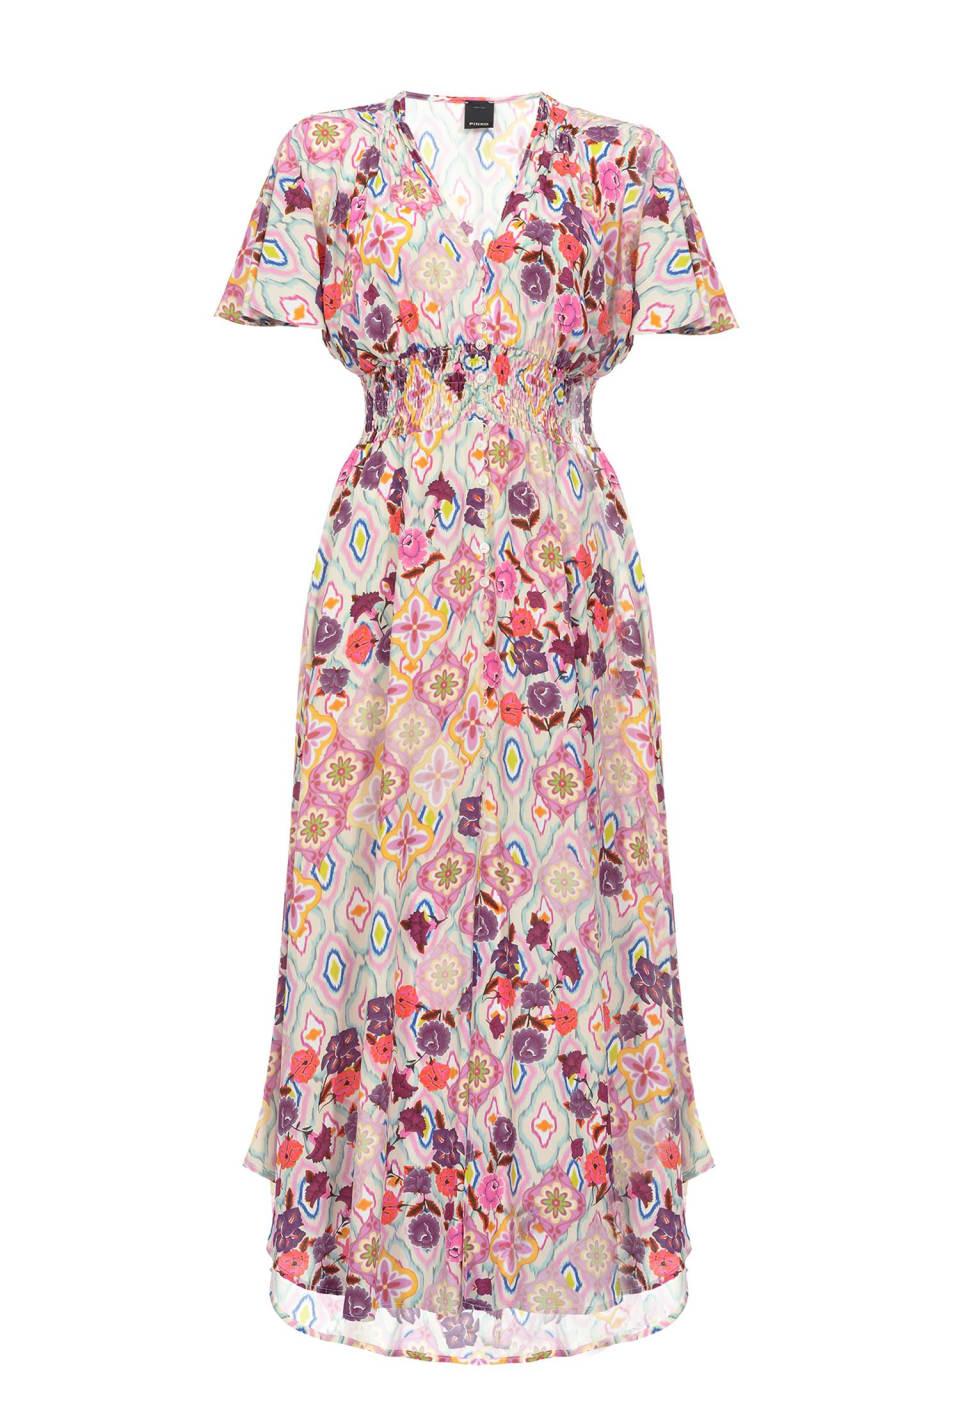 Ikat floral print dress